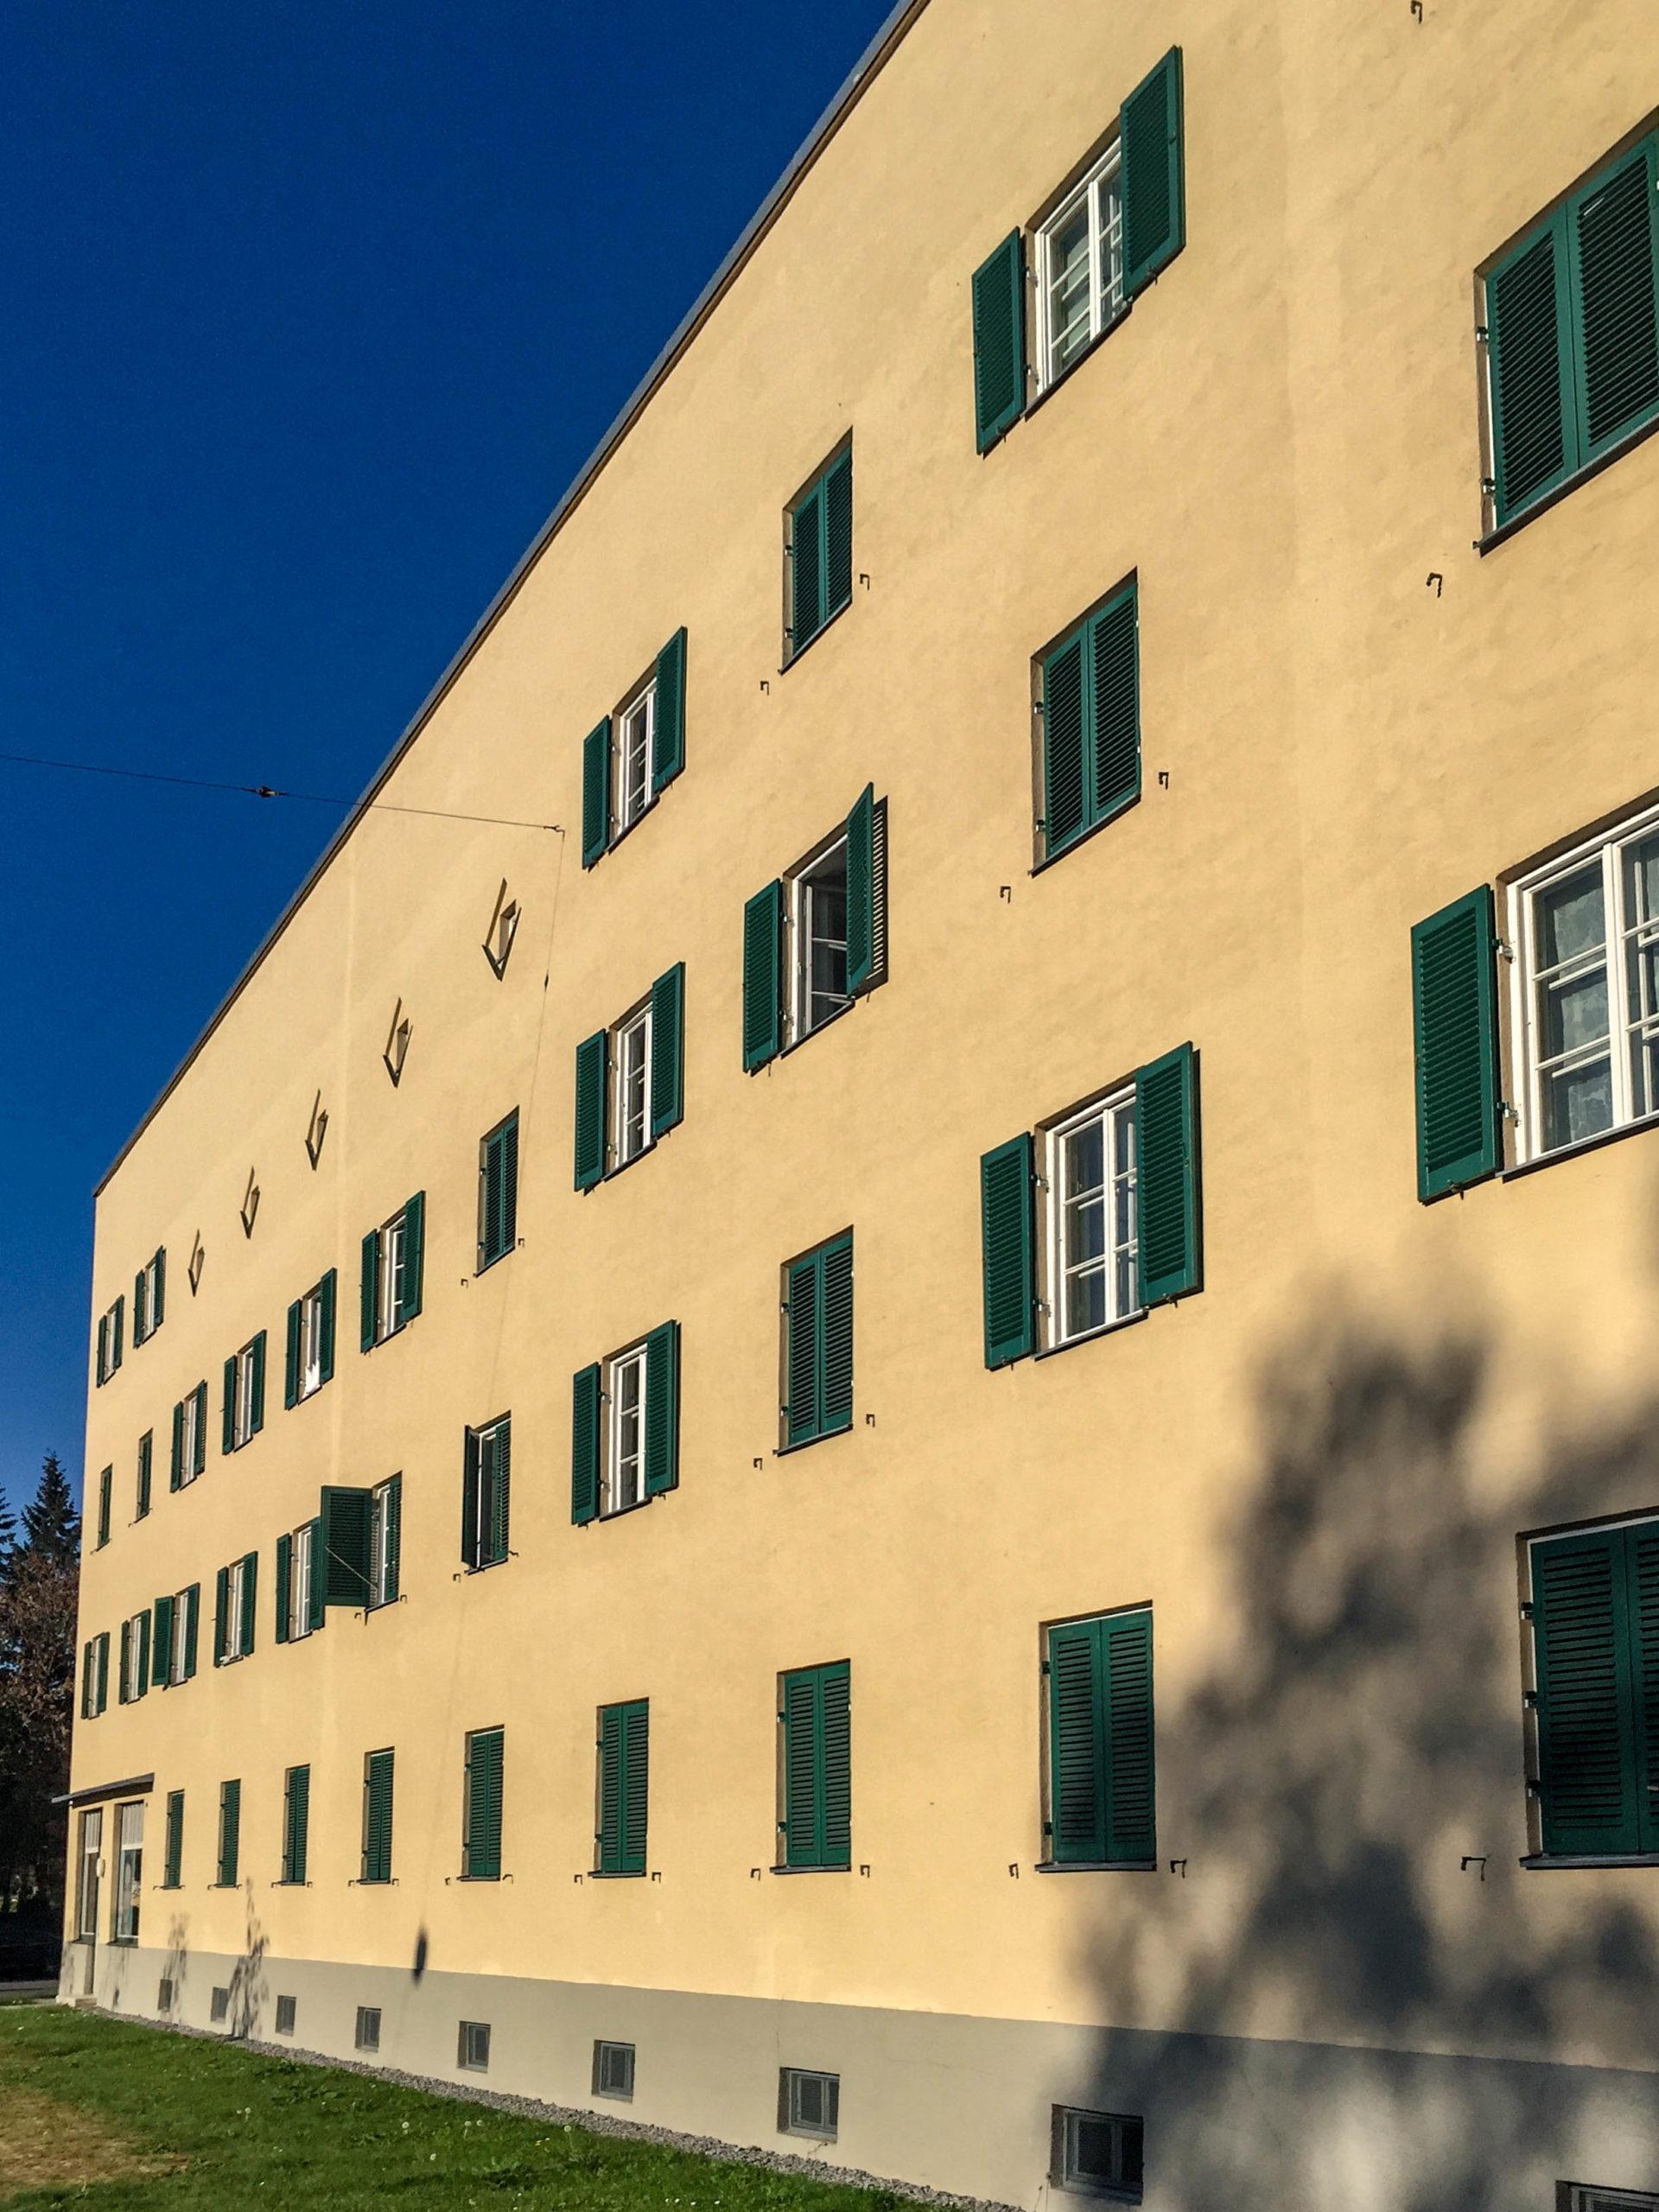 Birkenhof, 1927-1928. Architect: Otto Holzer